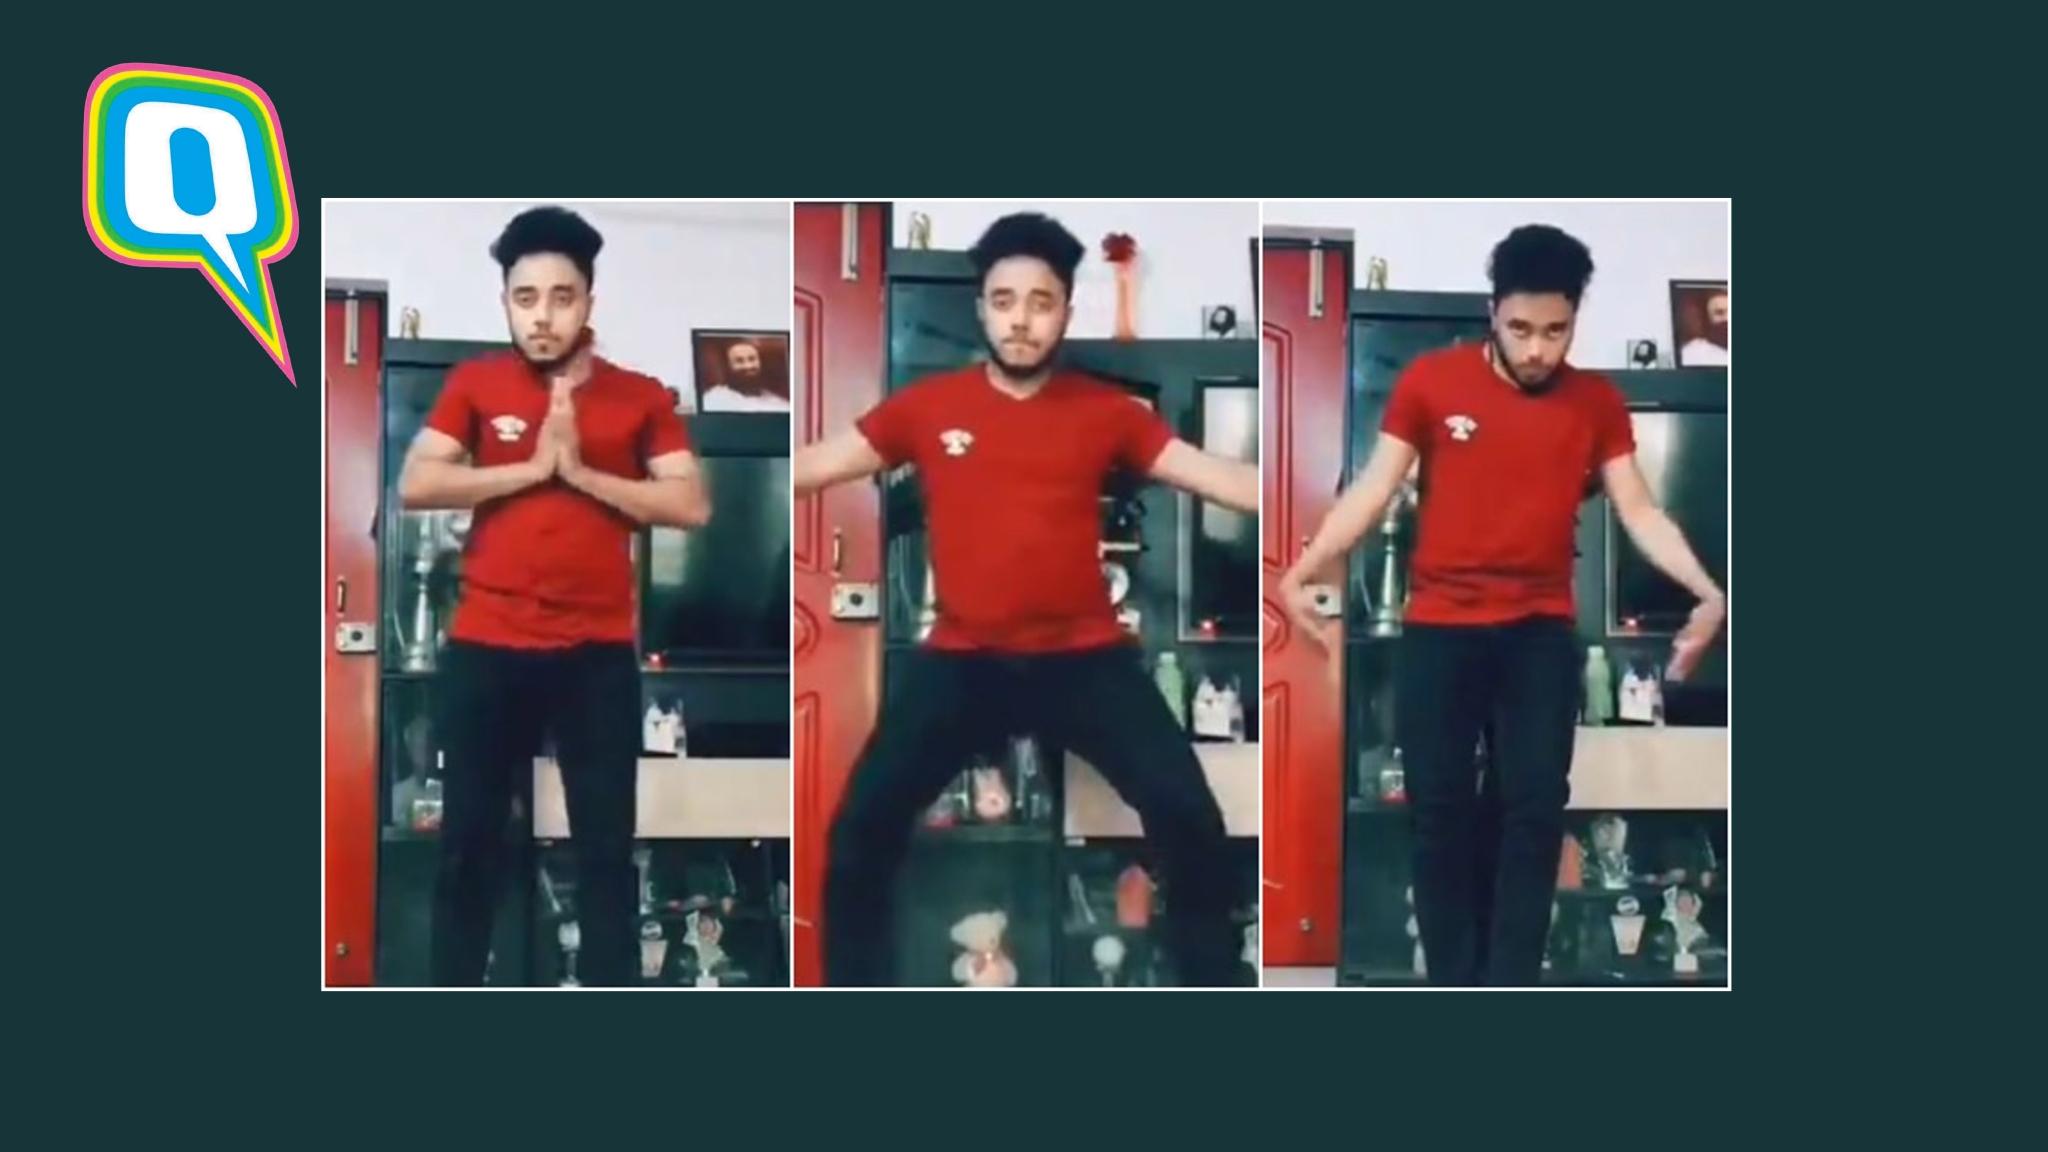 Man's Break Dance Breaks Internet With Doordarshan Groovy Moves